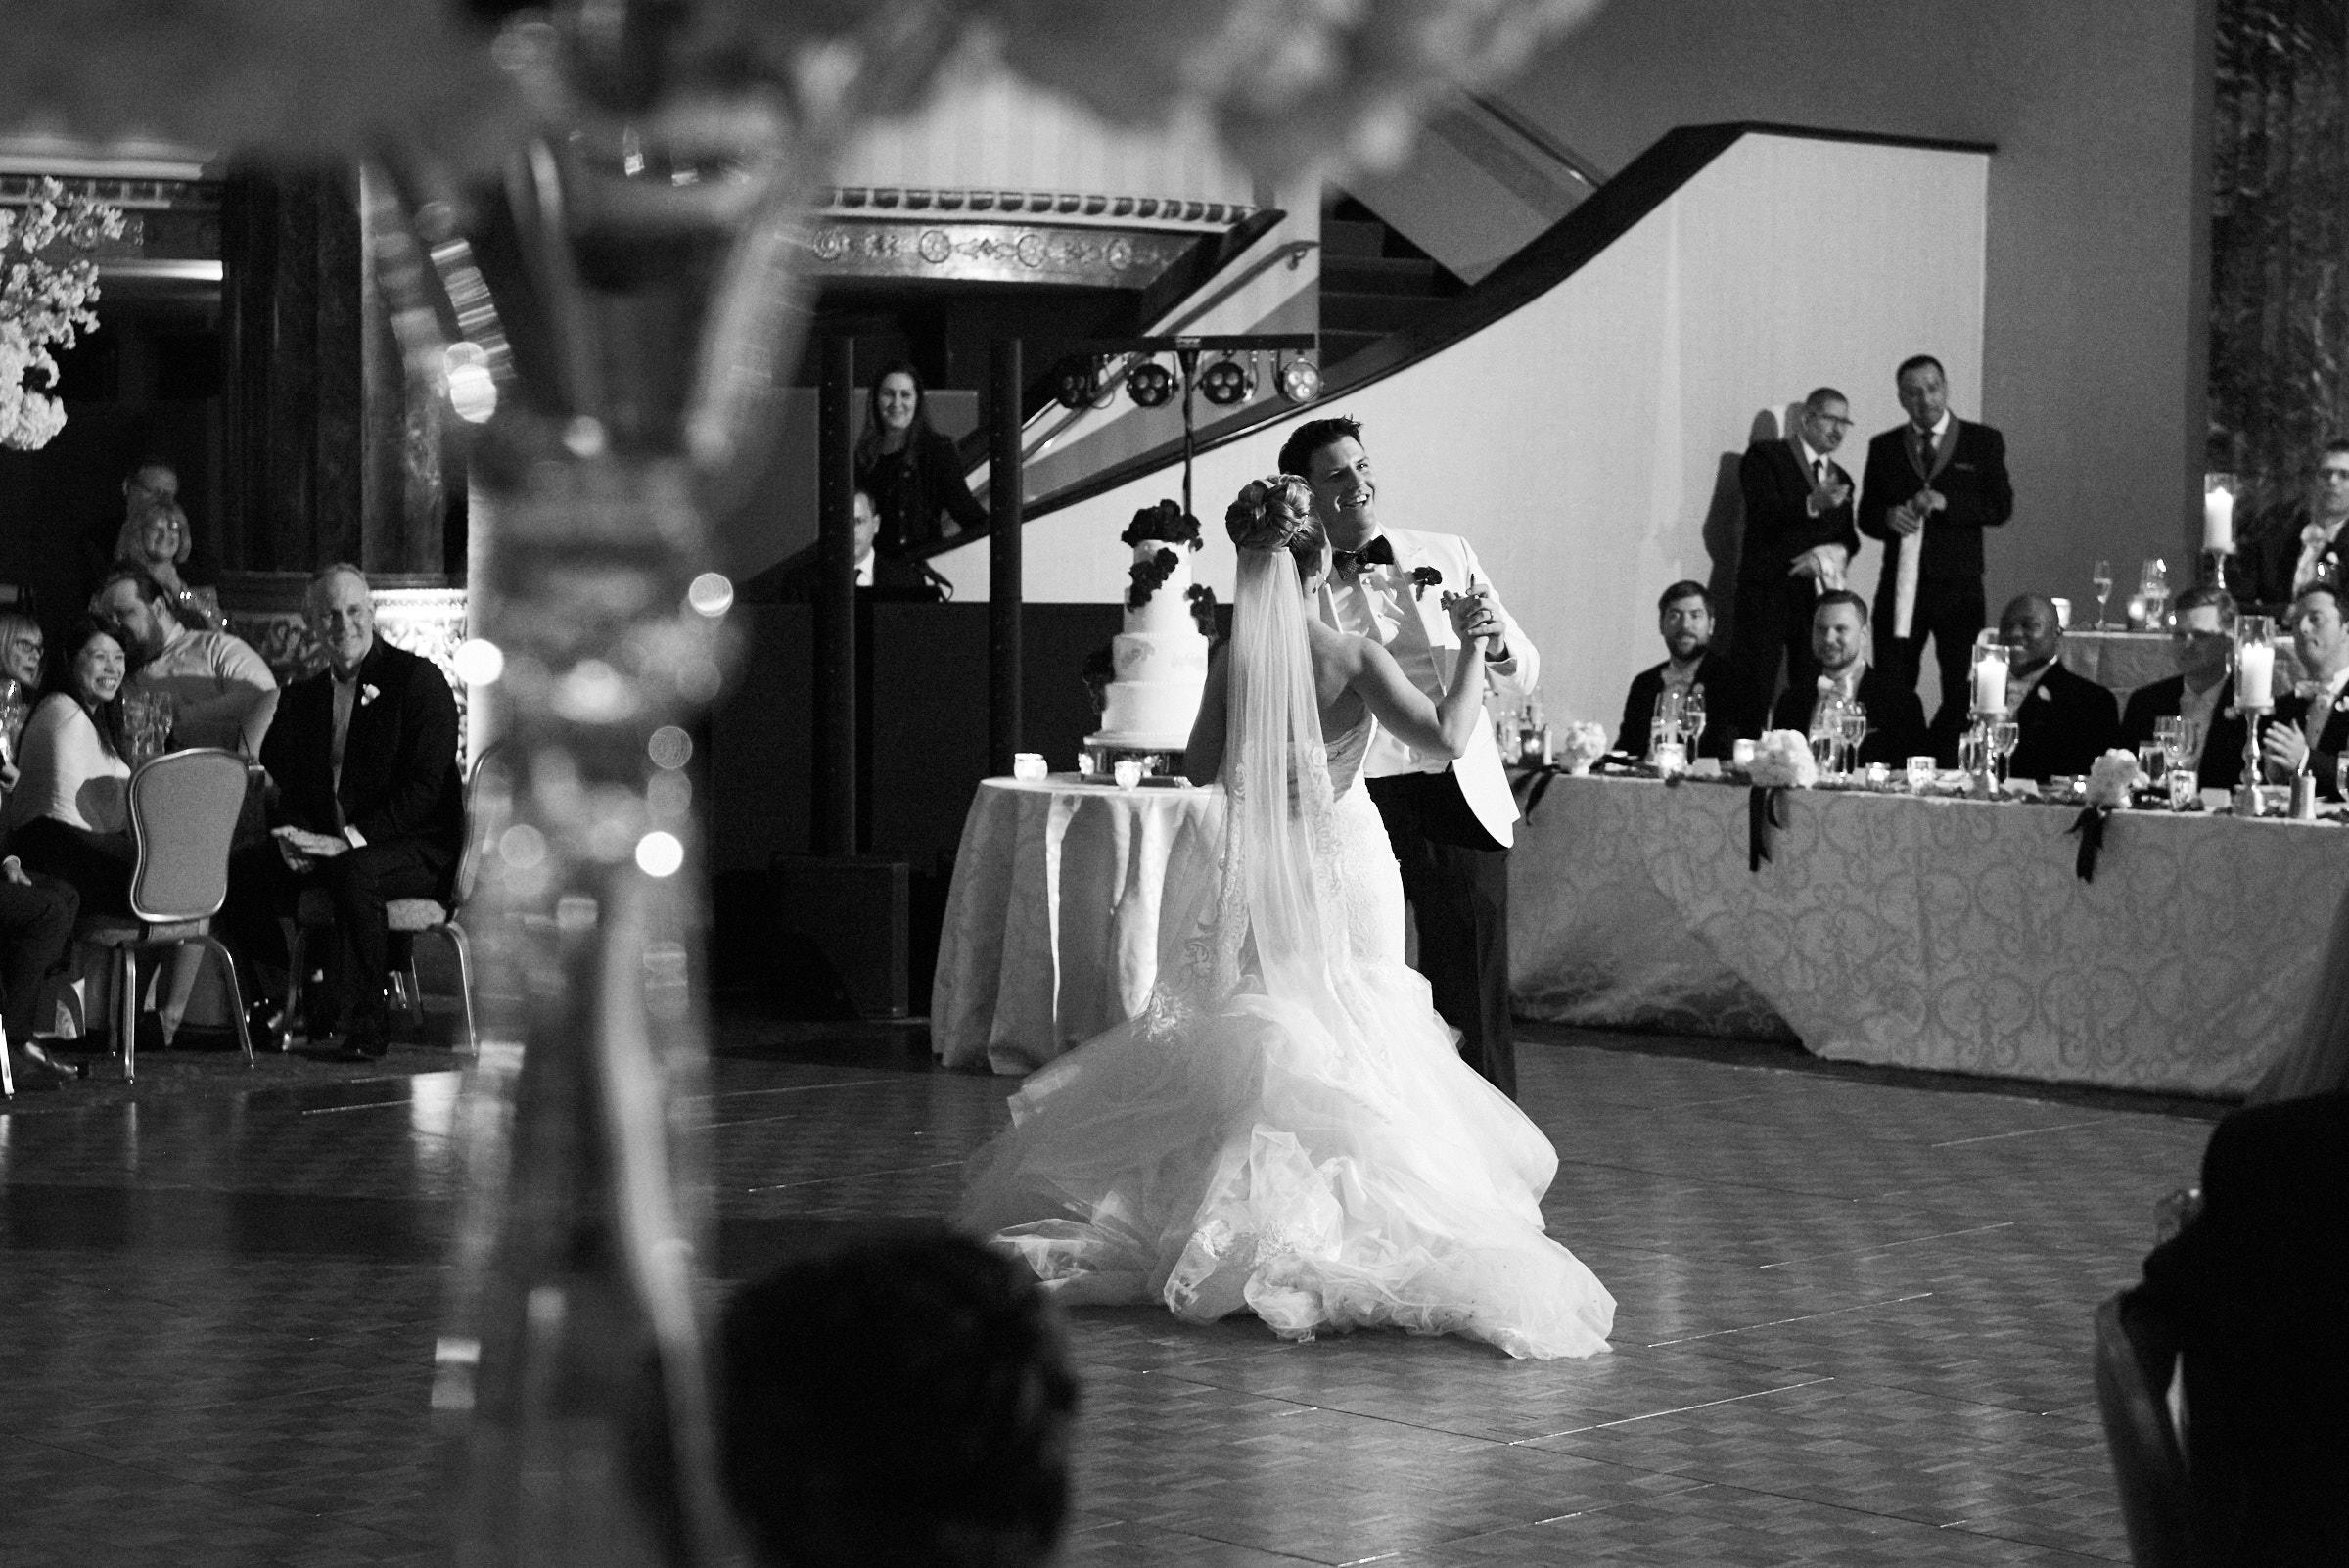 First wedding dance at Intercontinental Hotel Chicago